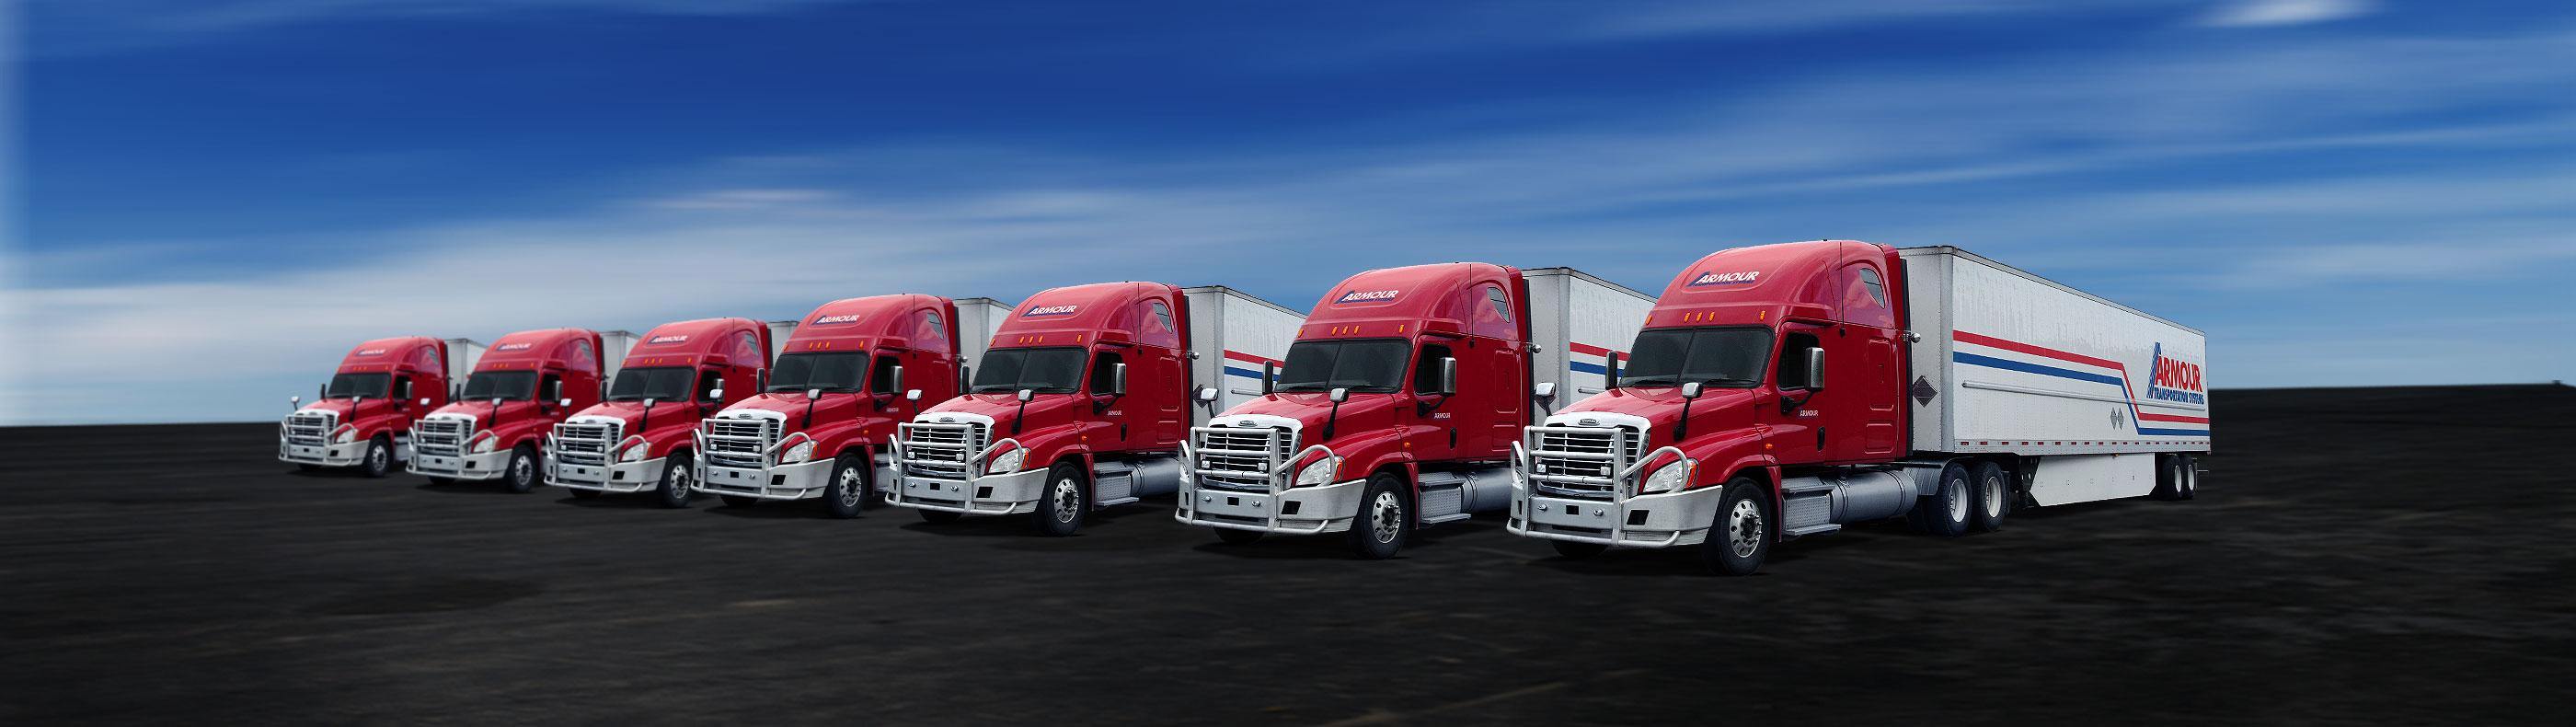 Armour Transportation fleet of trucks